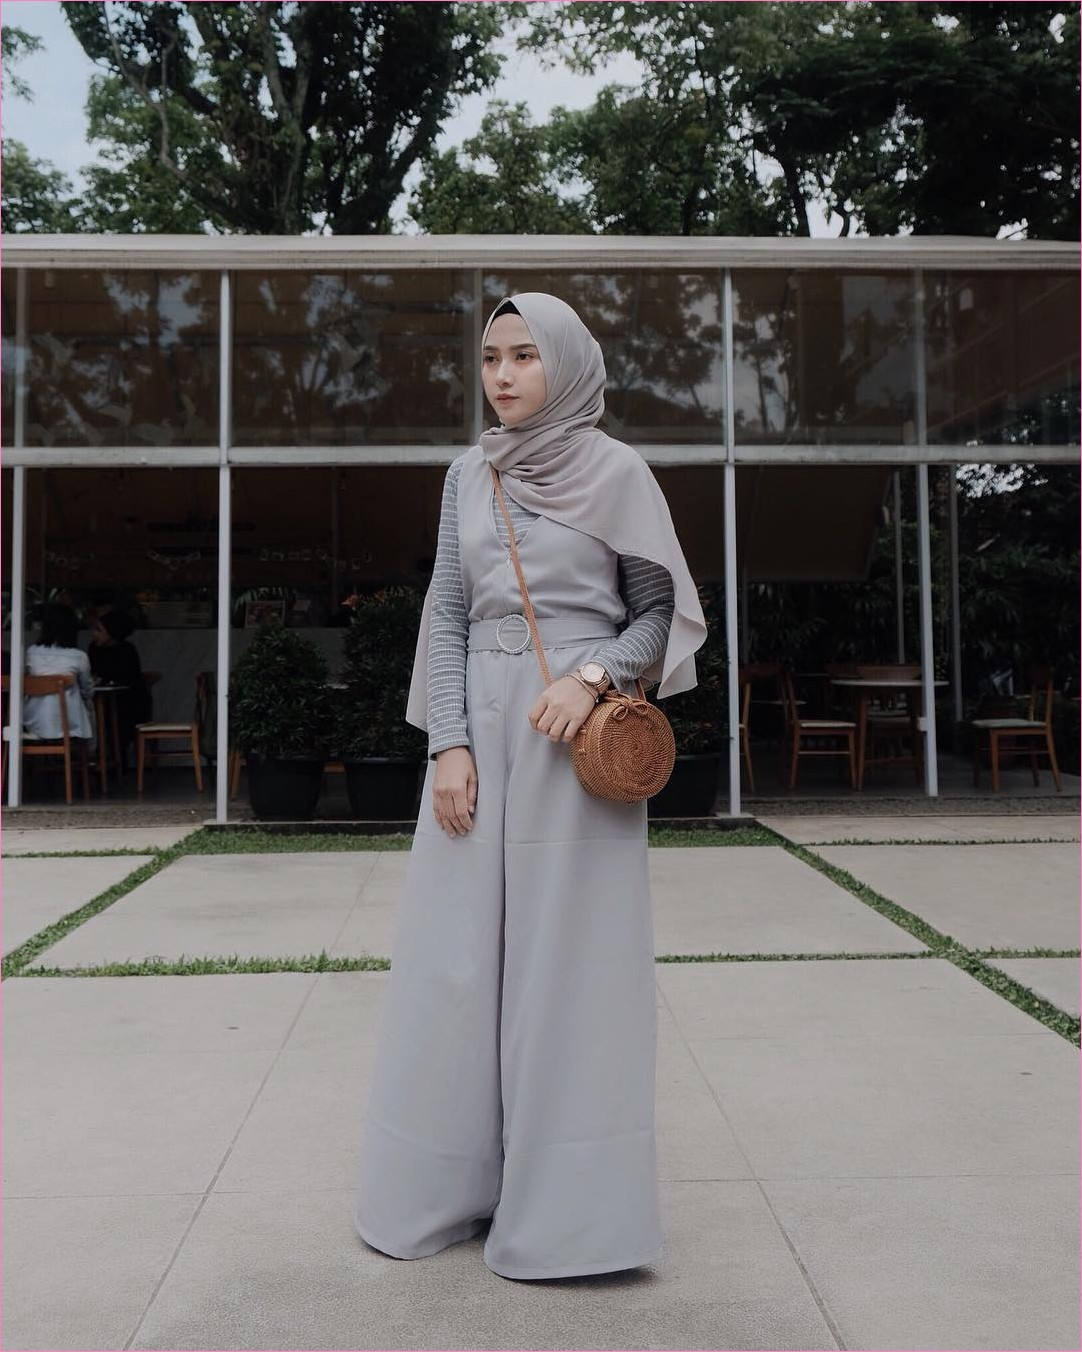 Outfit Kerudung Pashmina Ala Selebgram 2018 hijab pashmina diamond abu muda baju kodok mangset stripe celana cullotes pallazo jam tangan putih slingbags rotan coklat ootd trendy kekian ciput rajut kaca hitam cafe